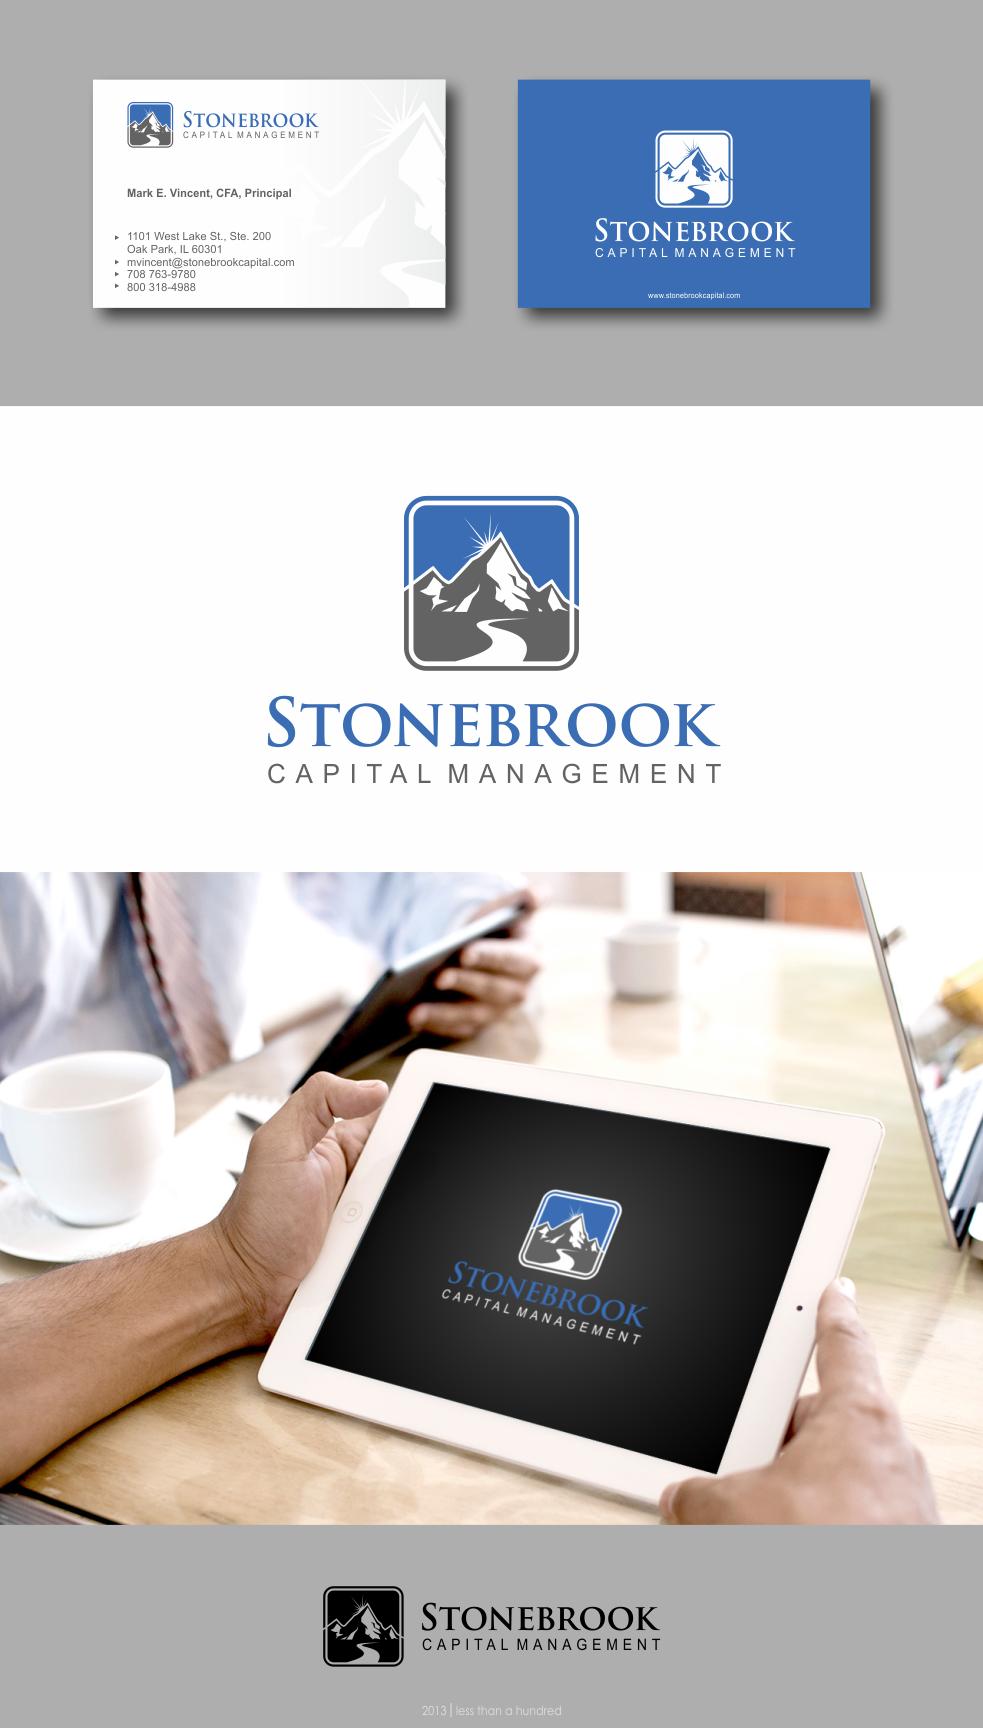 Stonebrook Capital Management needs a new logo